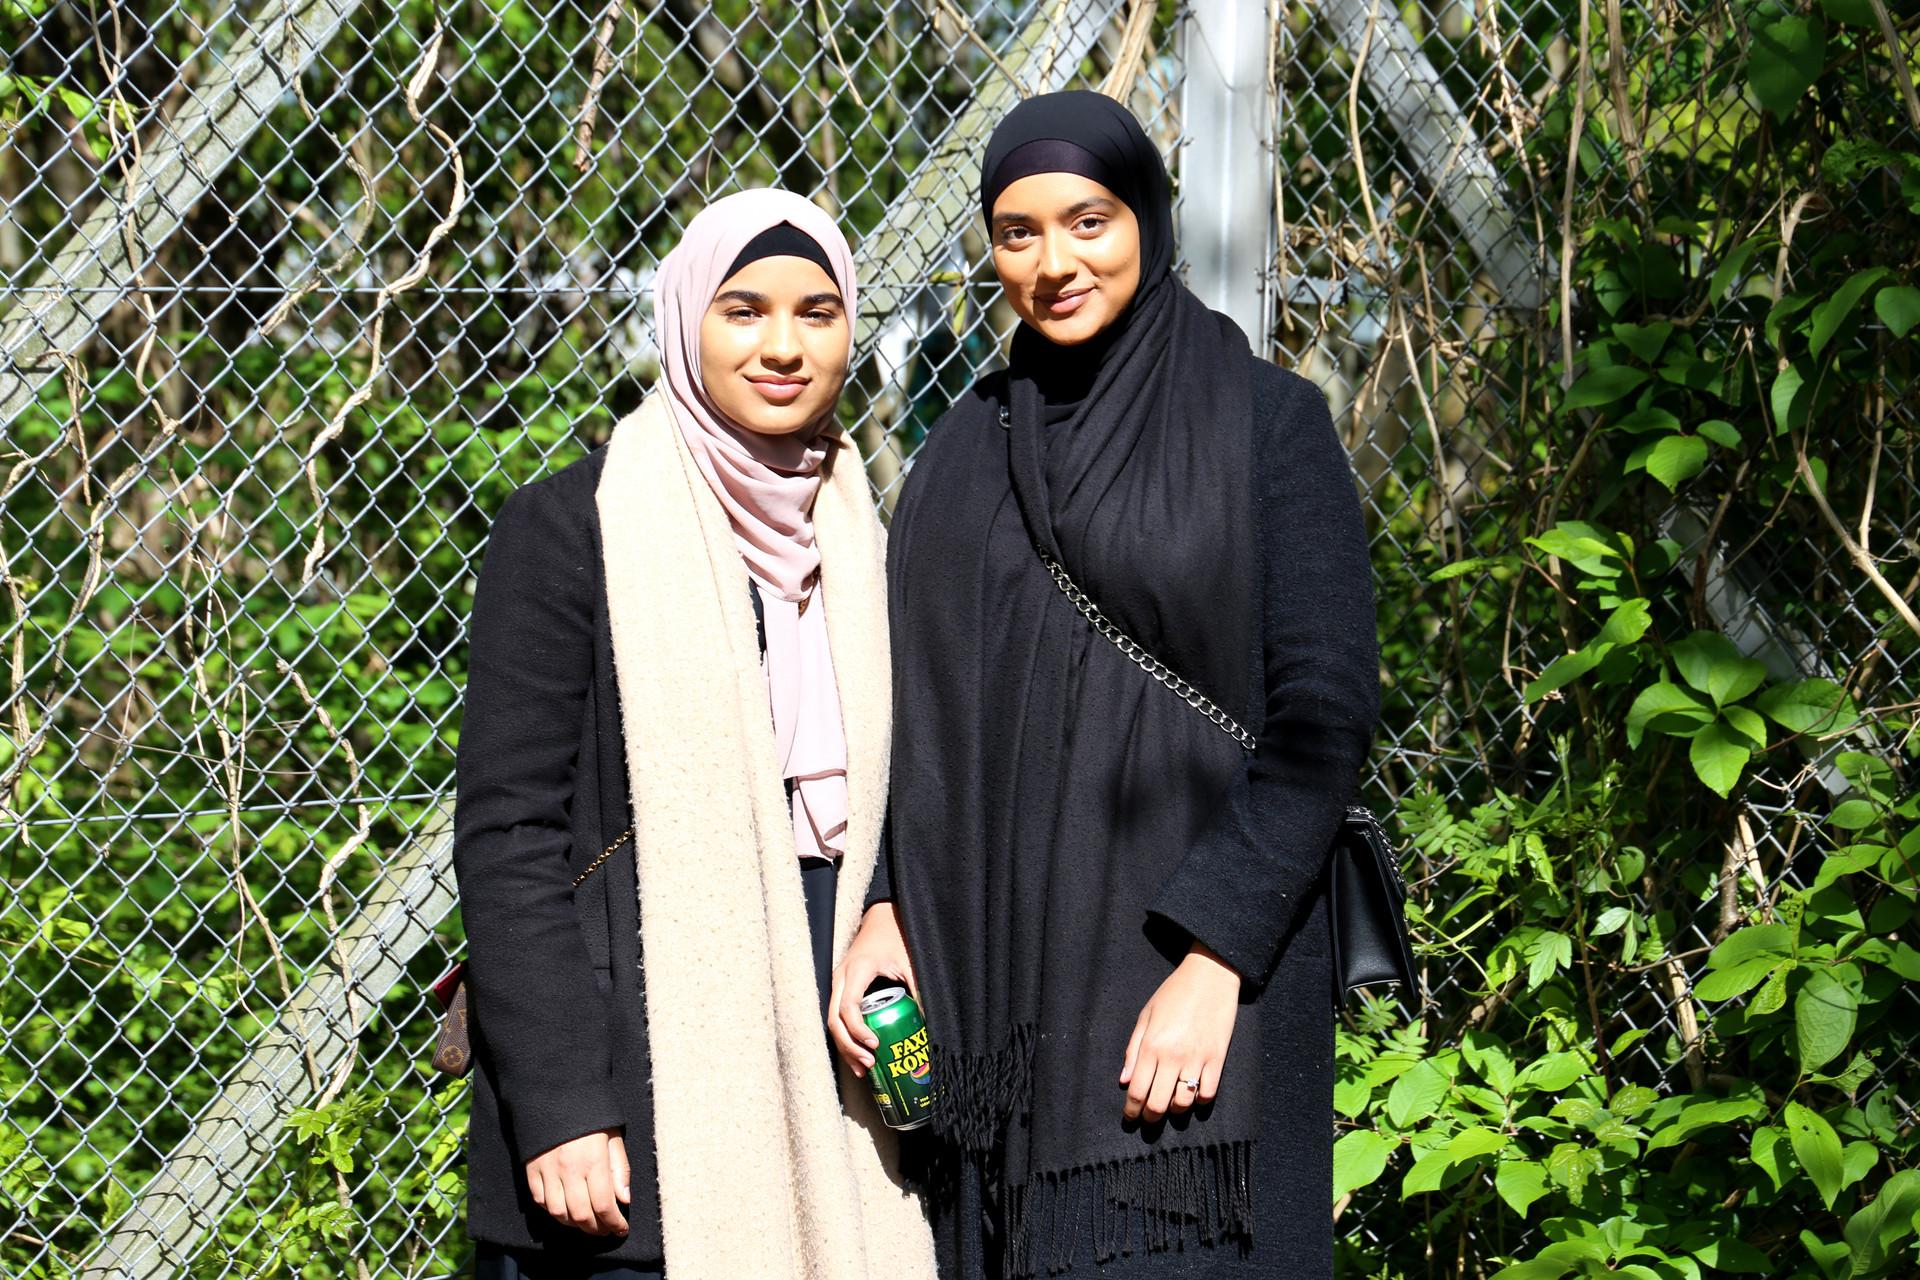 Simra og Aisha, der bor i Urbanplanen